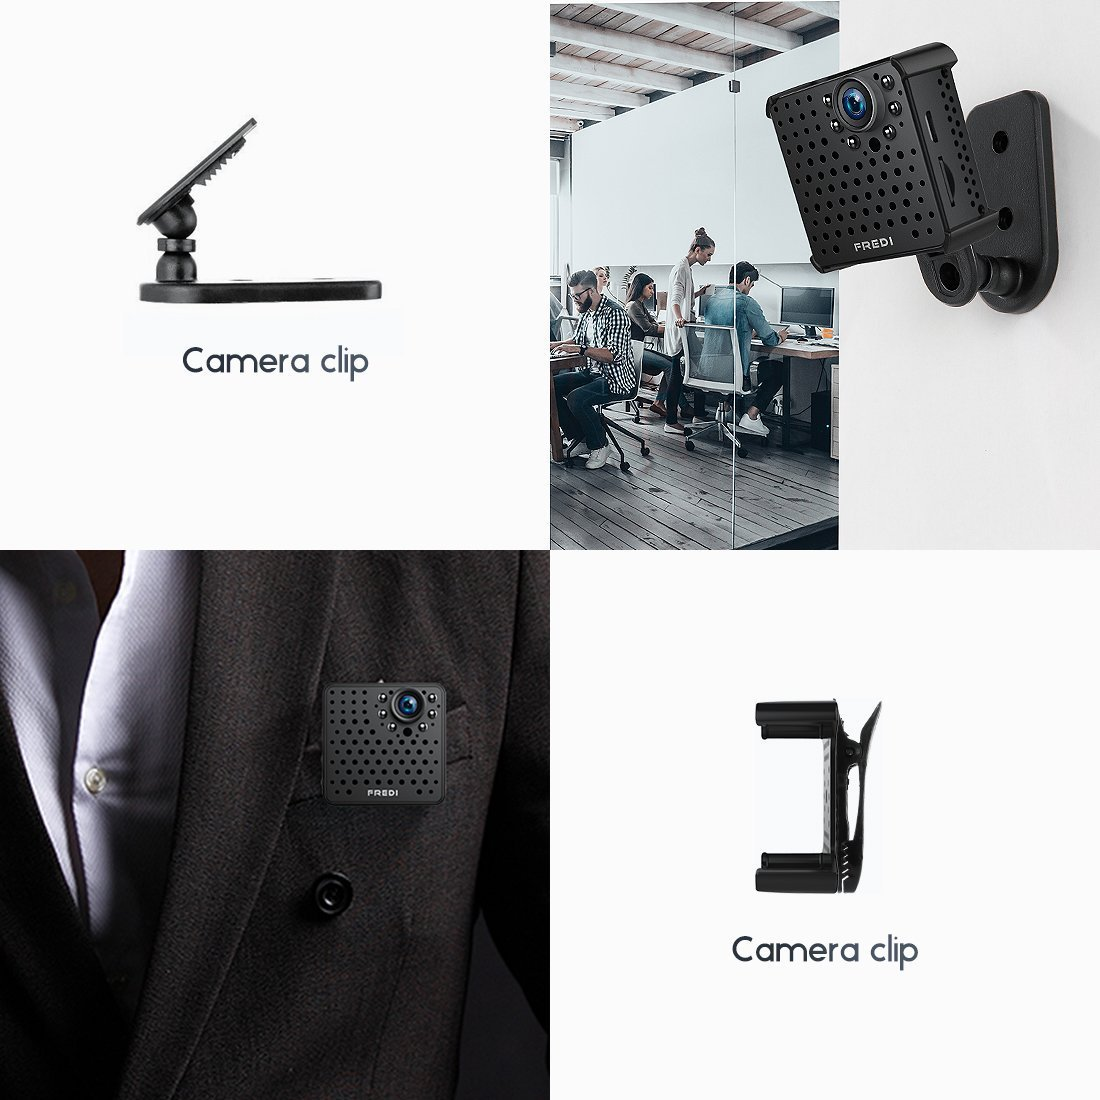 Amazon.com : Cameras Espias Wifi Inalambria Portable Vision Noche Detector Movimiento : Camera & Photo